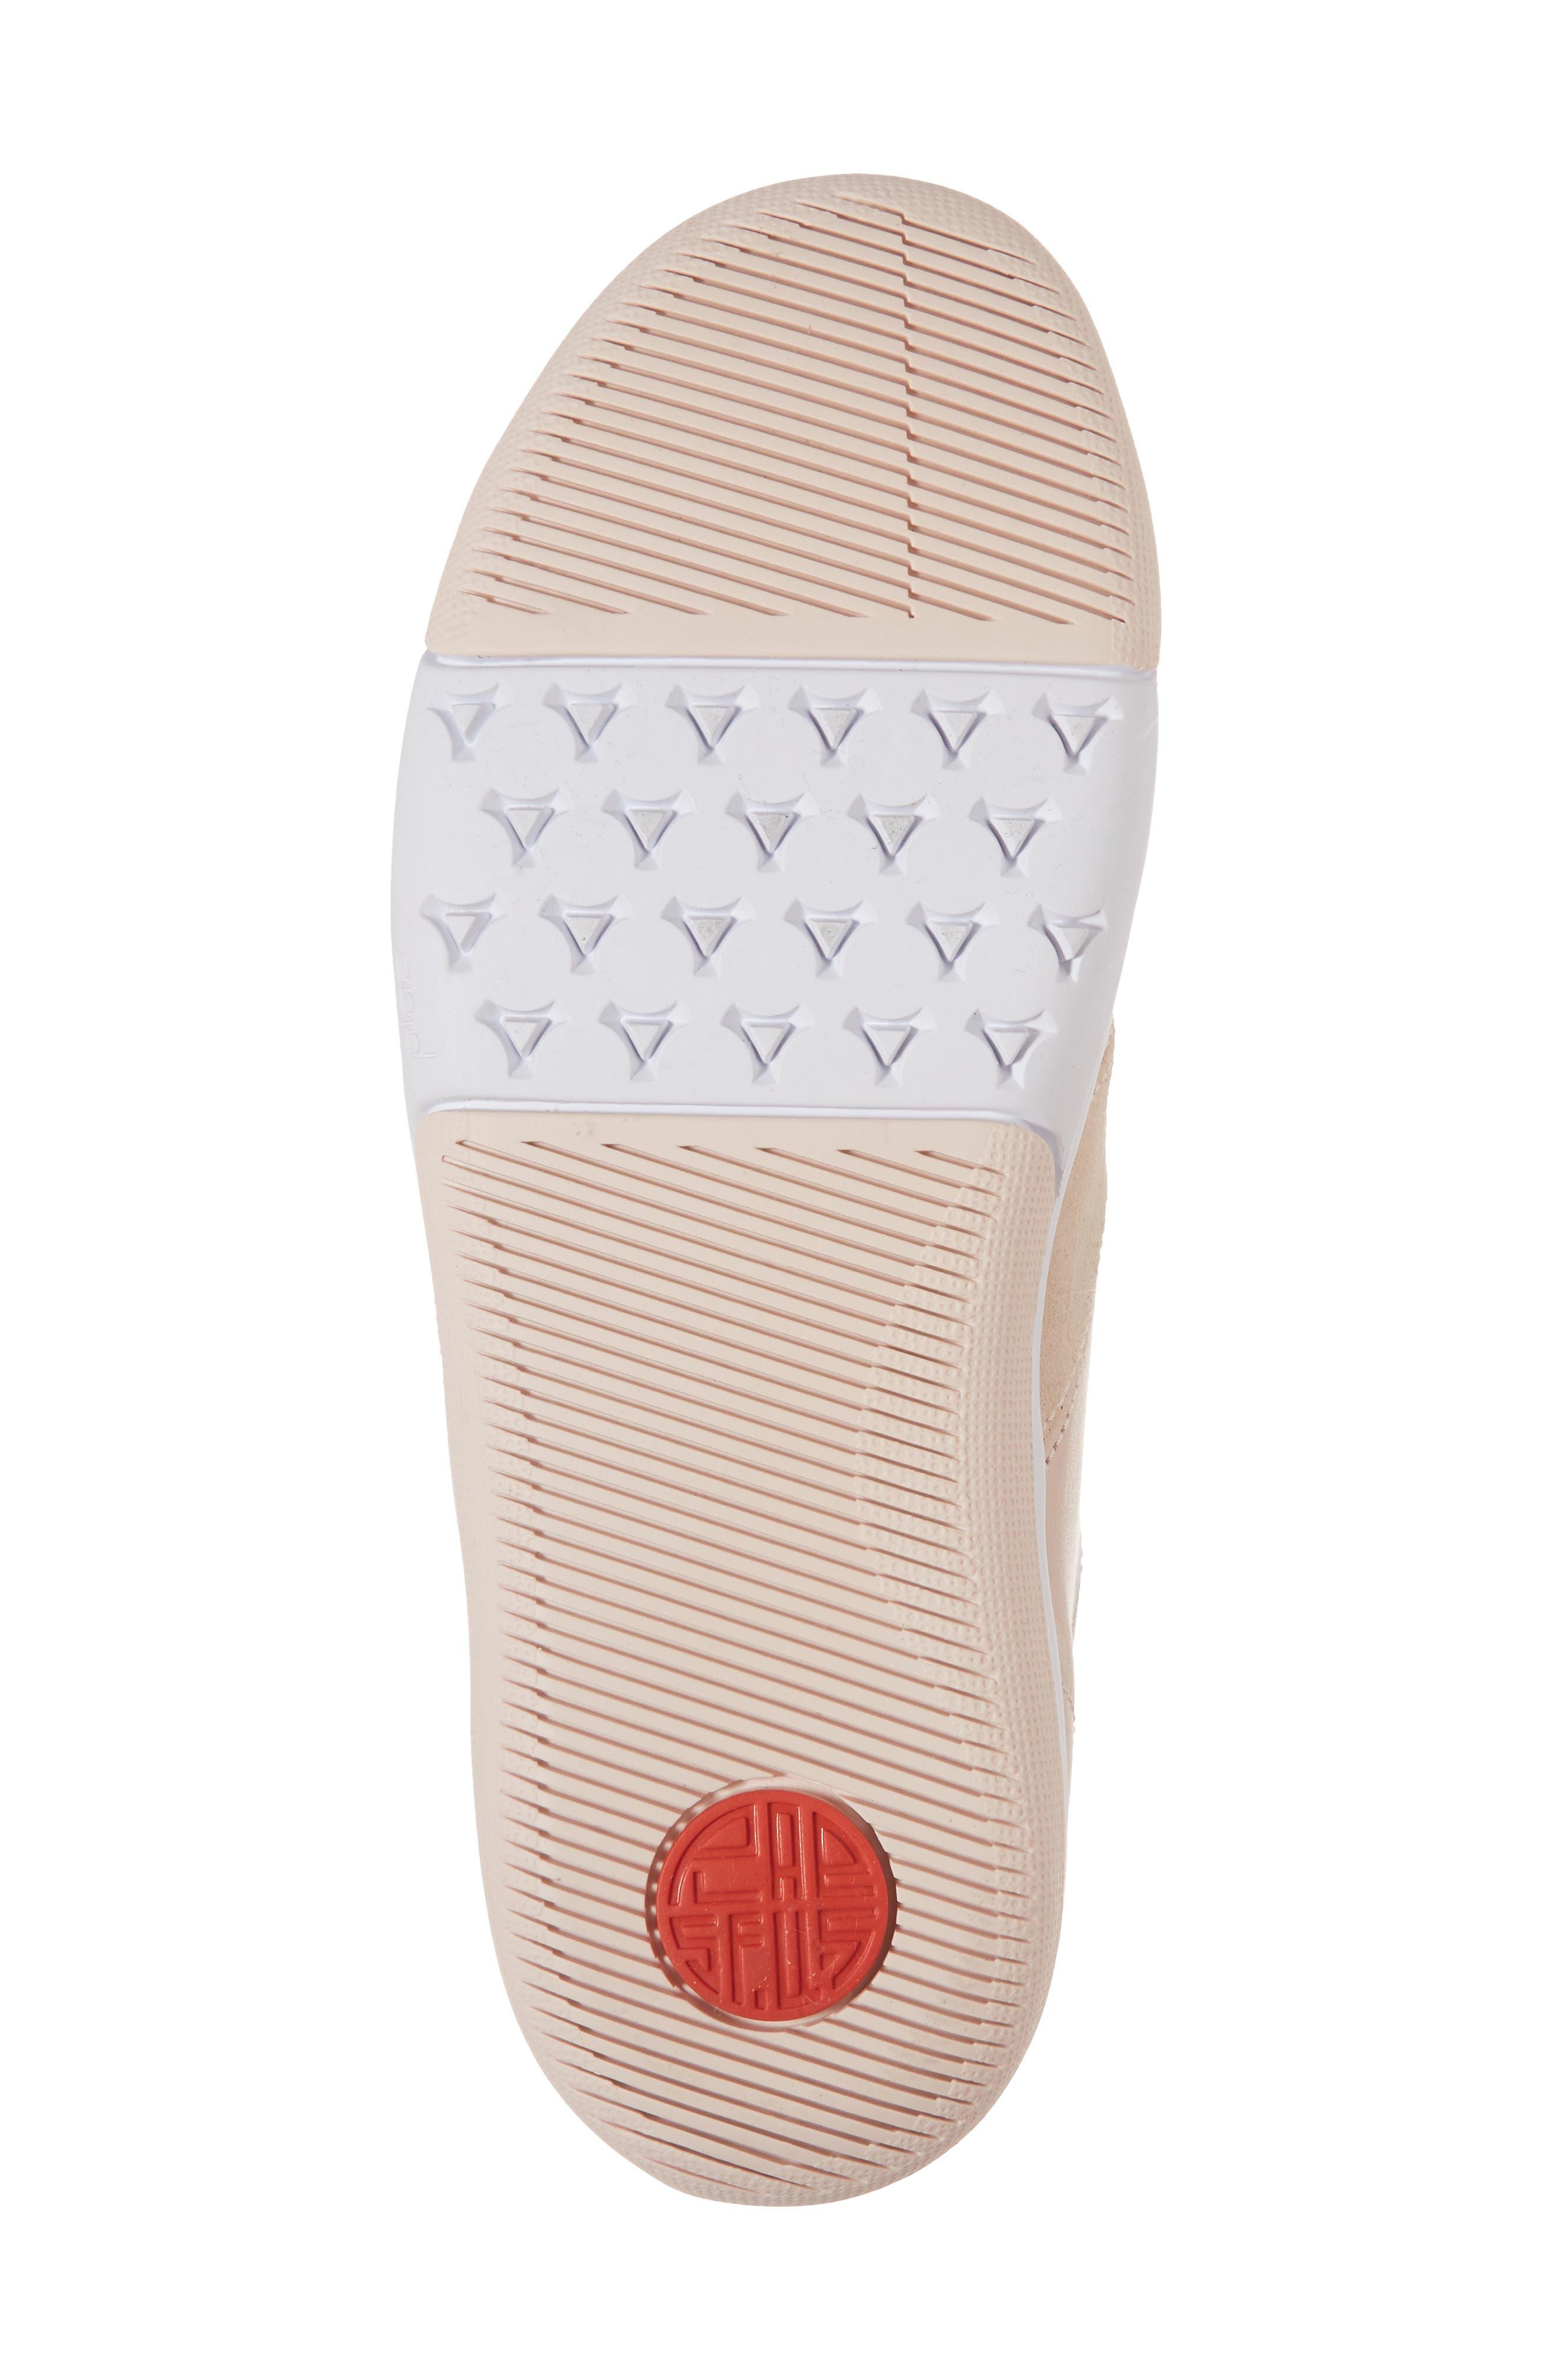 Larkin Sneaker,                             Alternate thumbnail 6, color,                             Cameo Rose Leather